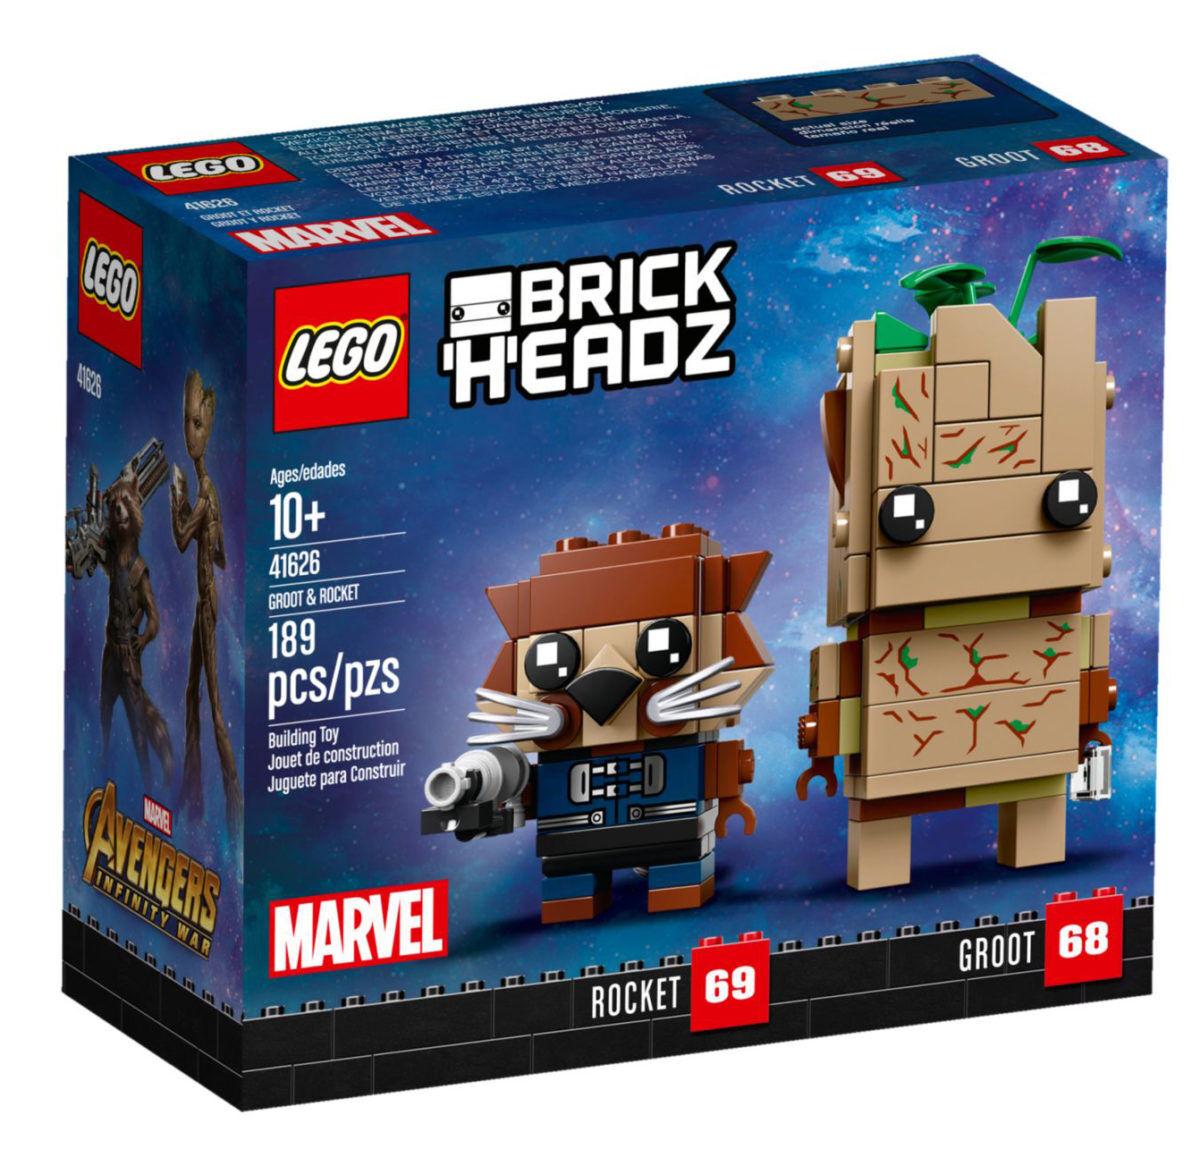 Lego brickheadz 41626 Marvel groot y rocket Exclusiv hard to find